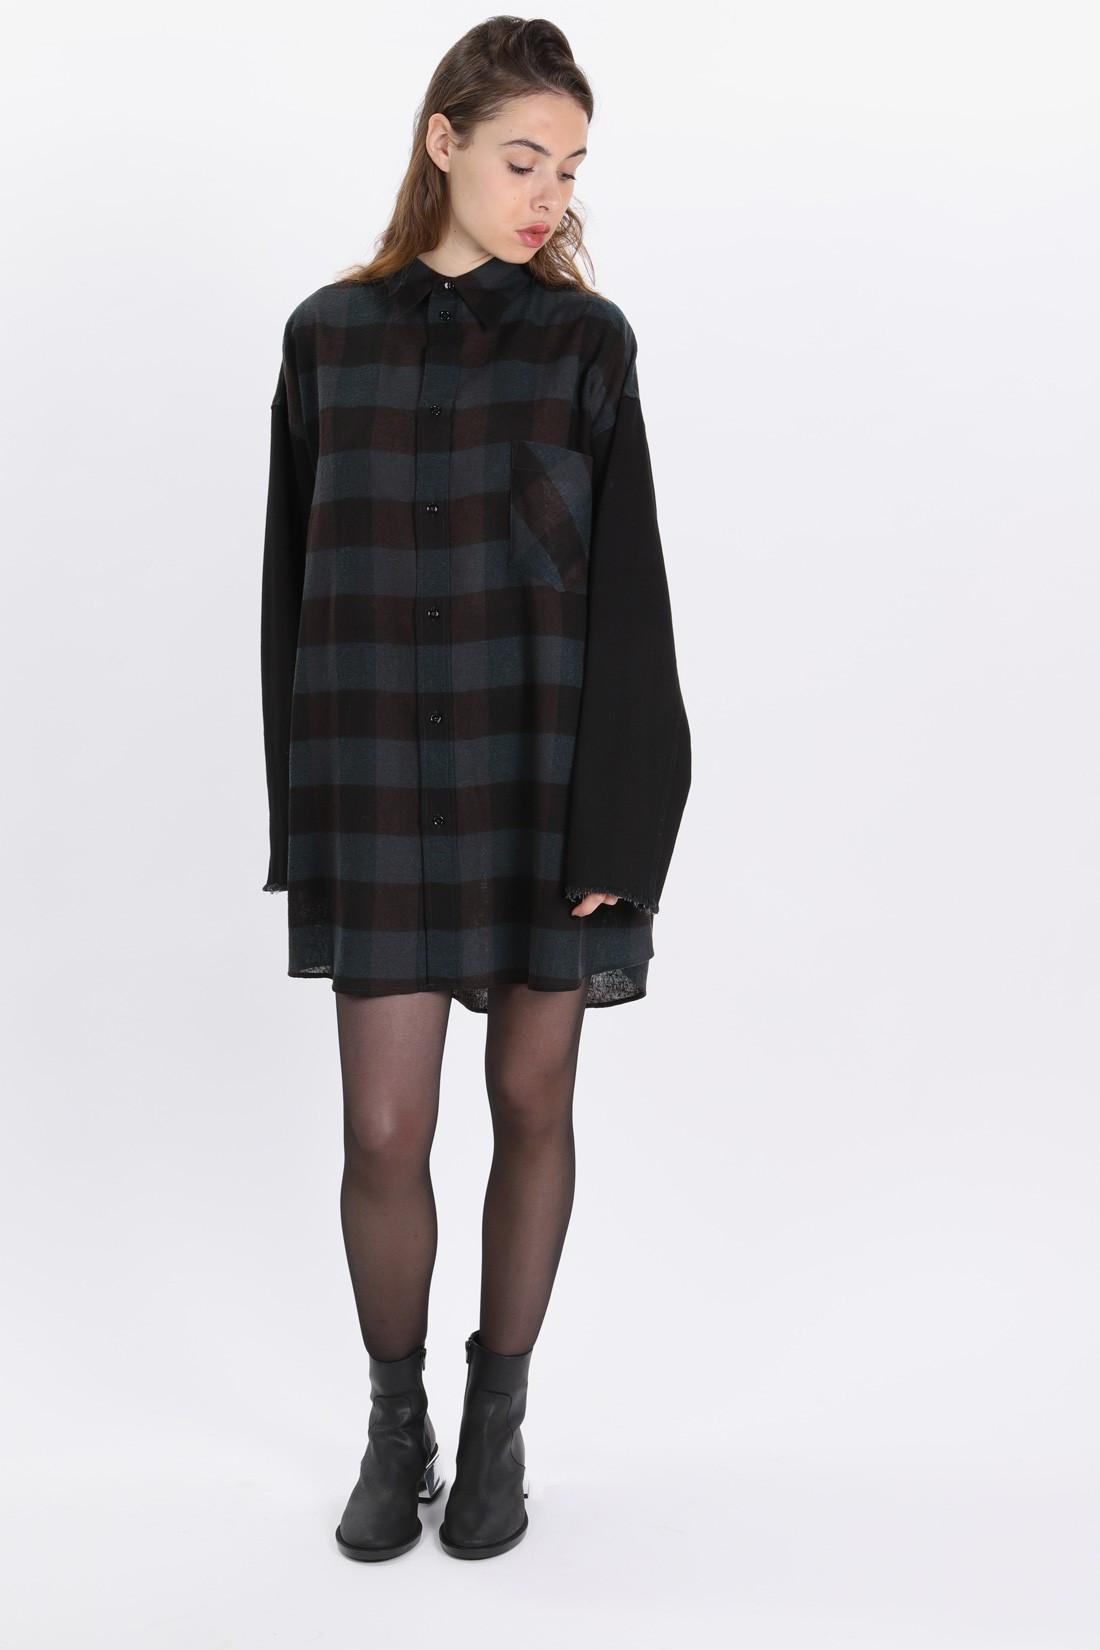 MM6 MAISON MARGIELA FOR WOMAN / Wool shirt dress Green/black